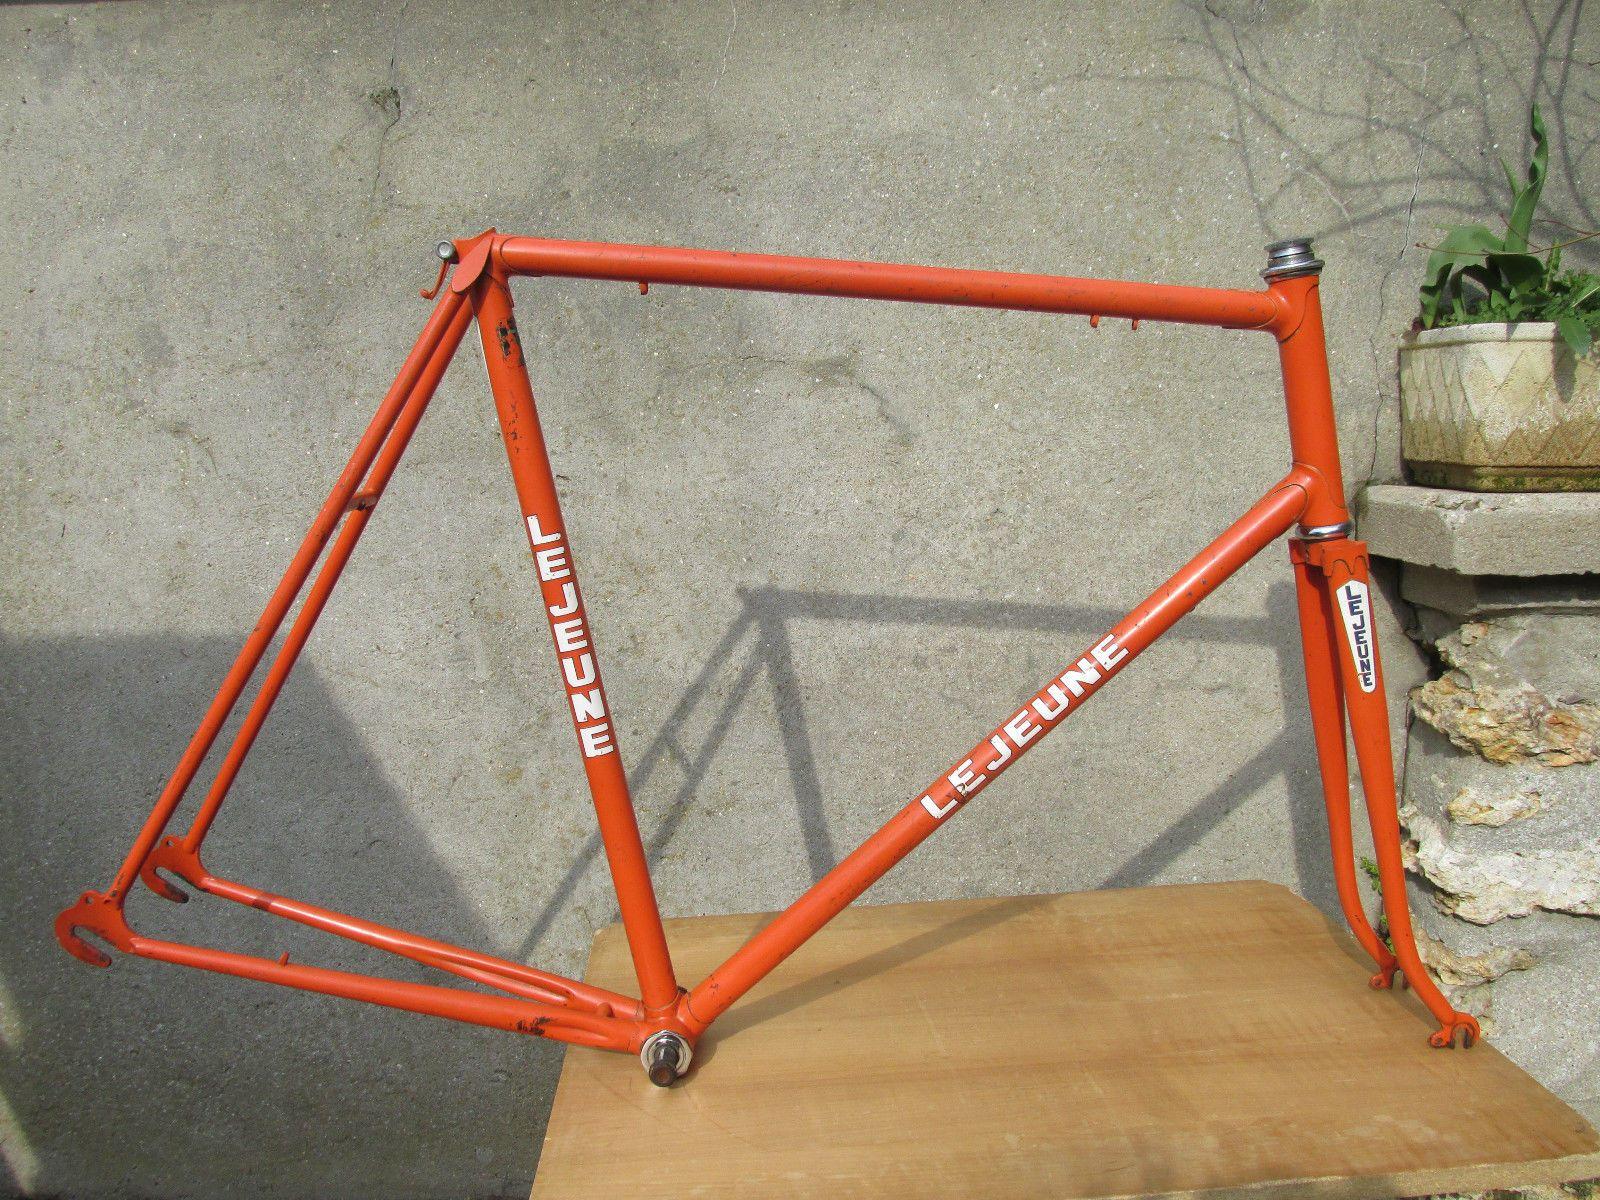 69b45f533ed Lejeune Reynolds 531 Vintage Cadre Velo Course Road Racing Bicycle Frame 60    eBay